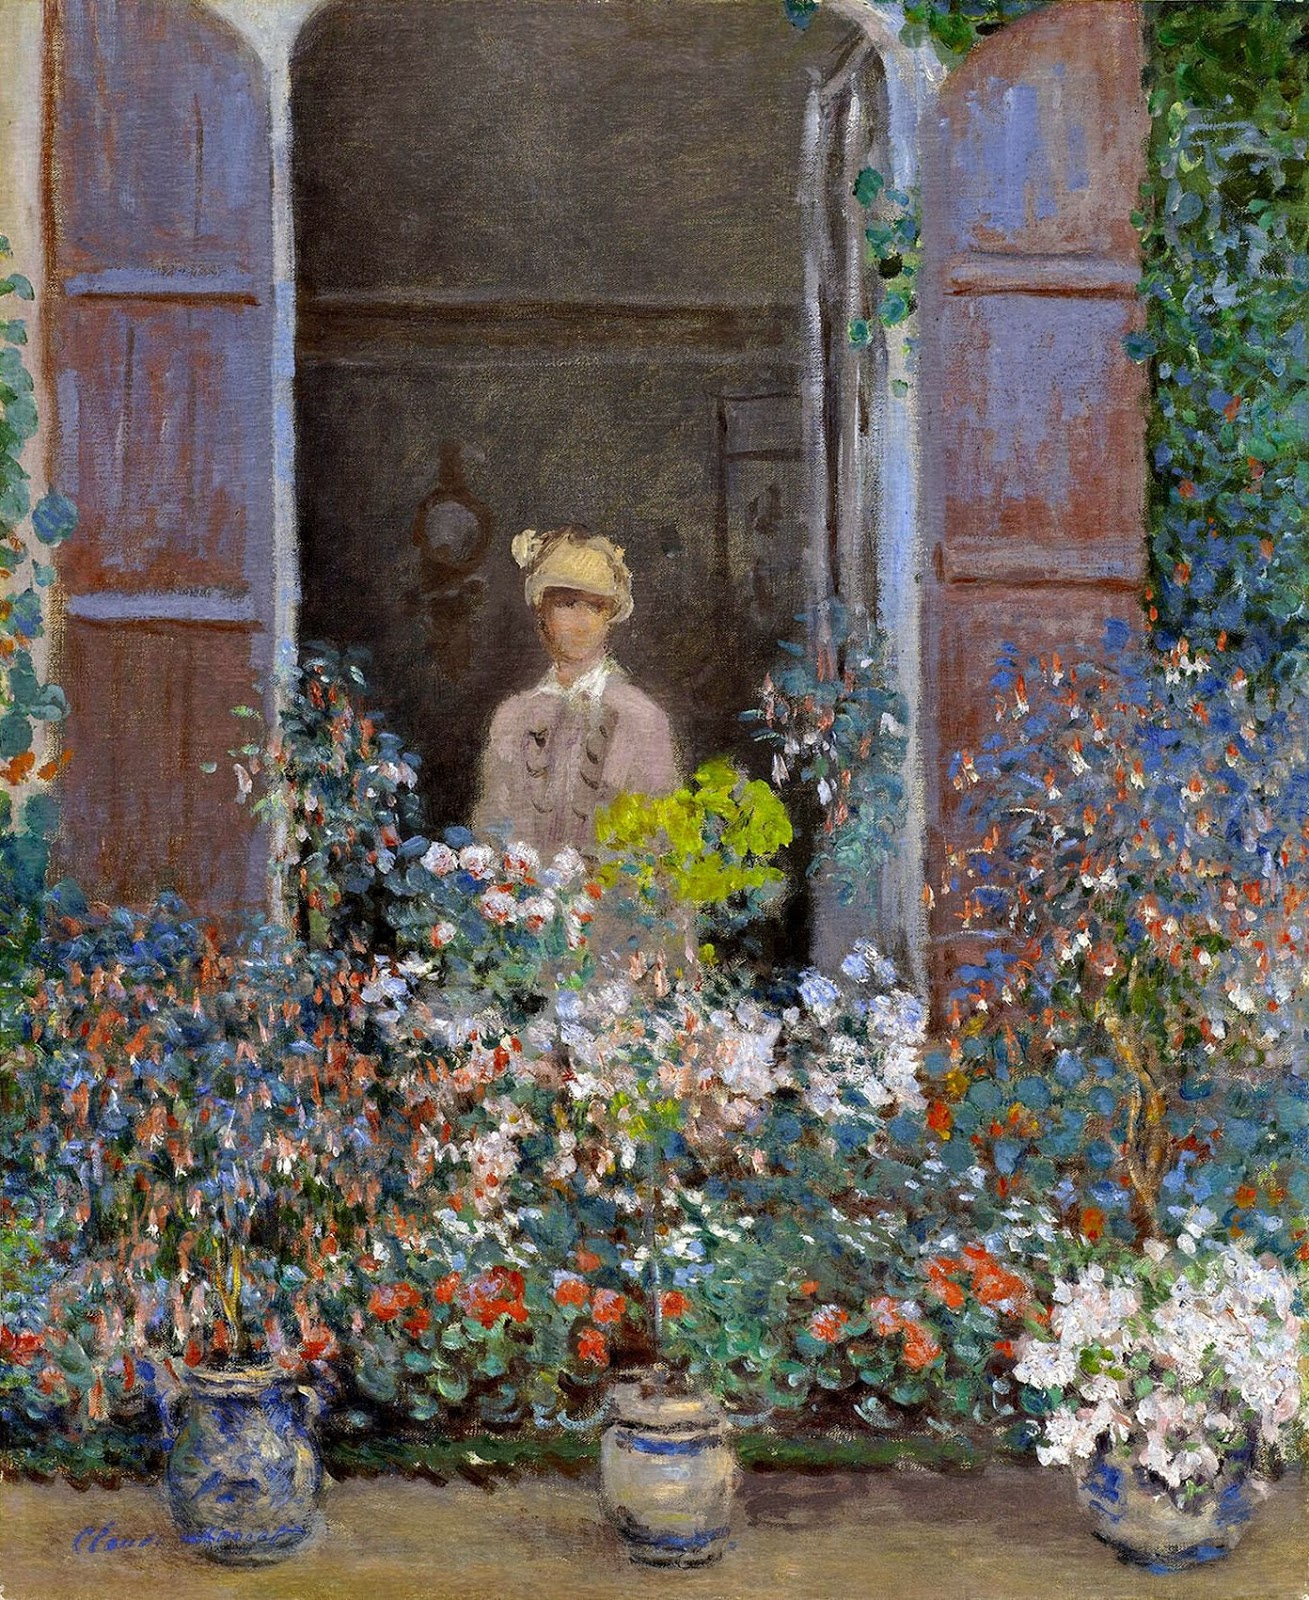 Claude-Monet-Camille-Monet-at-the-Window-Argenteuil-1873